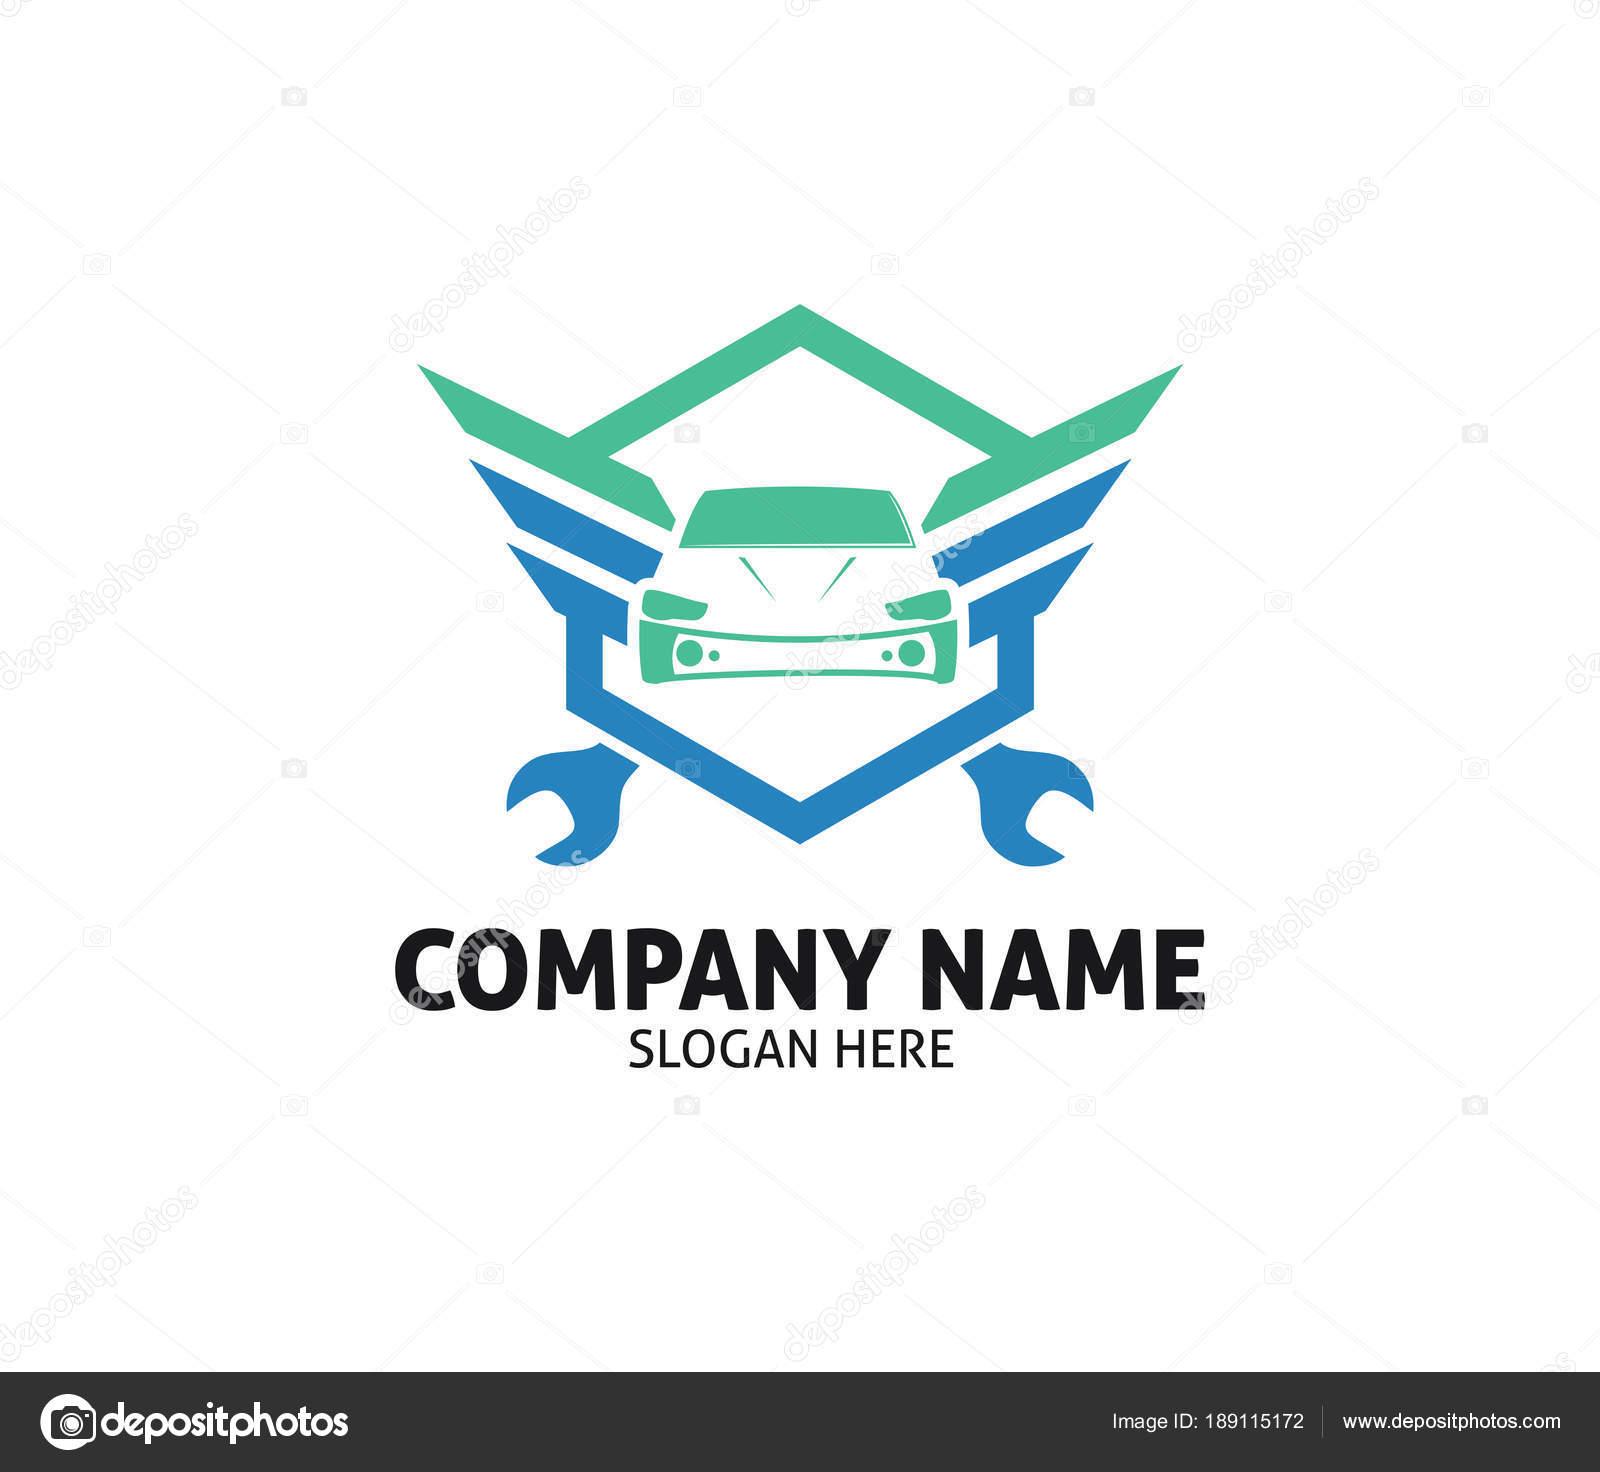 Autohändler Auto Pflege Reparatur Service Vektor Logo Design